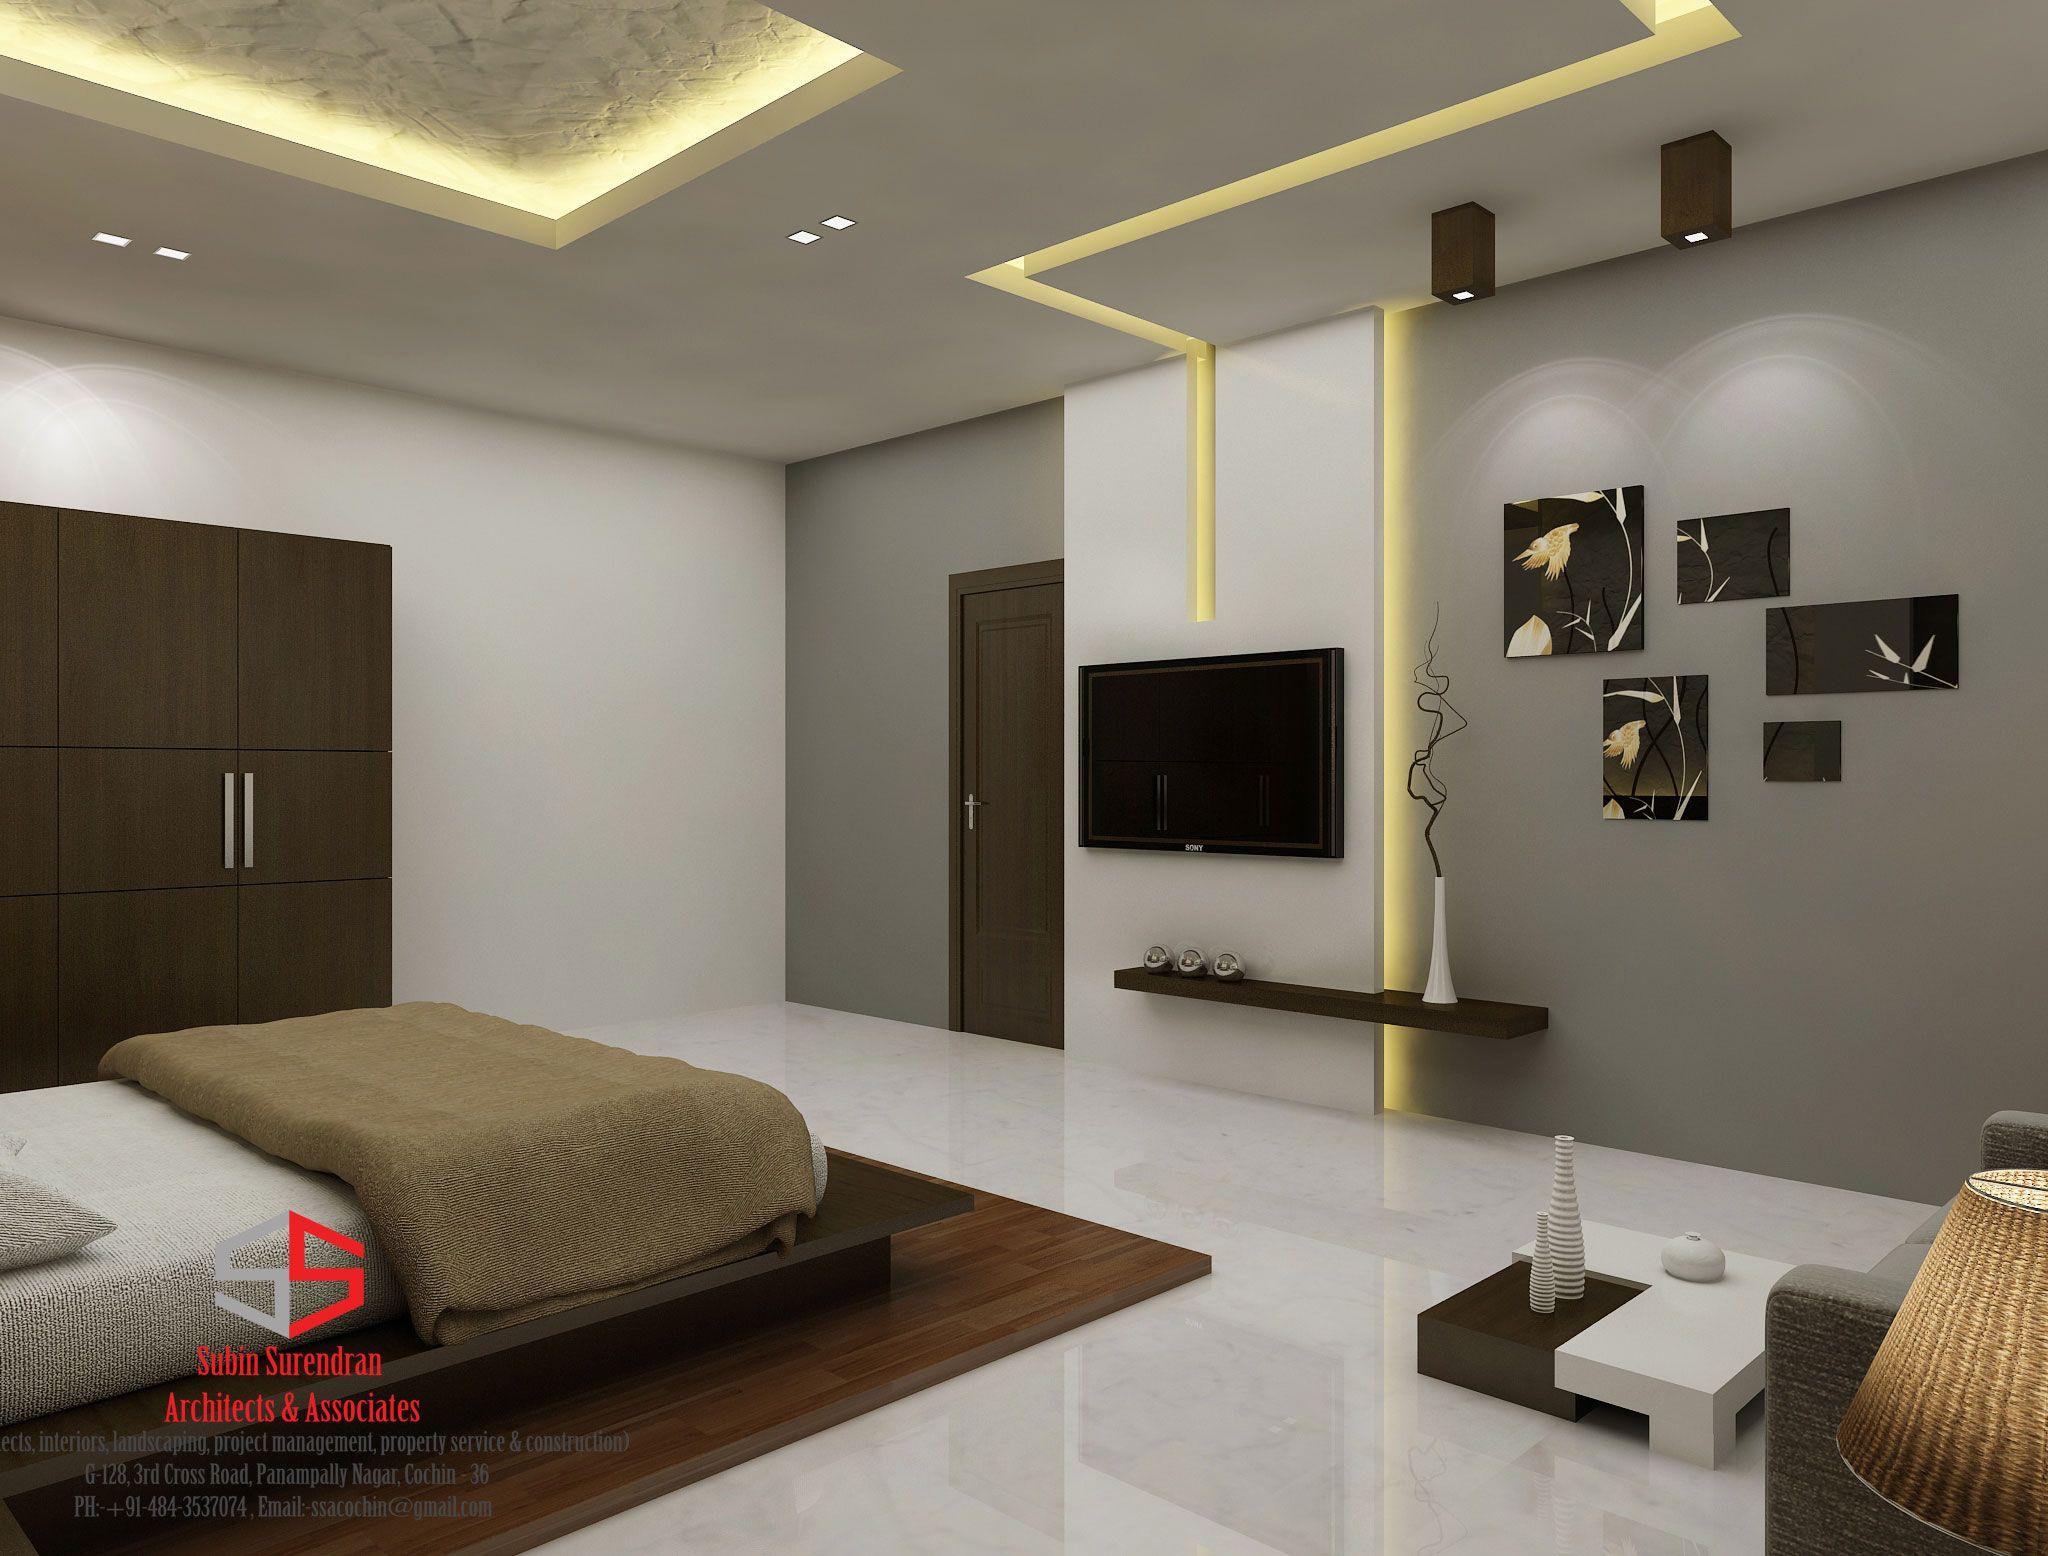 Bedroomfurnitureindiag interior pinterest